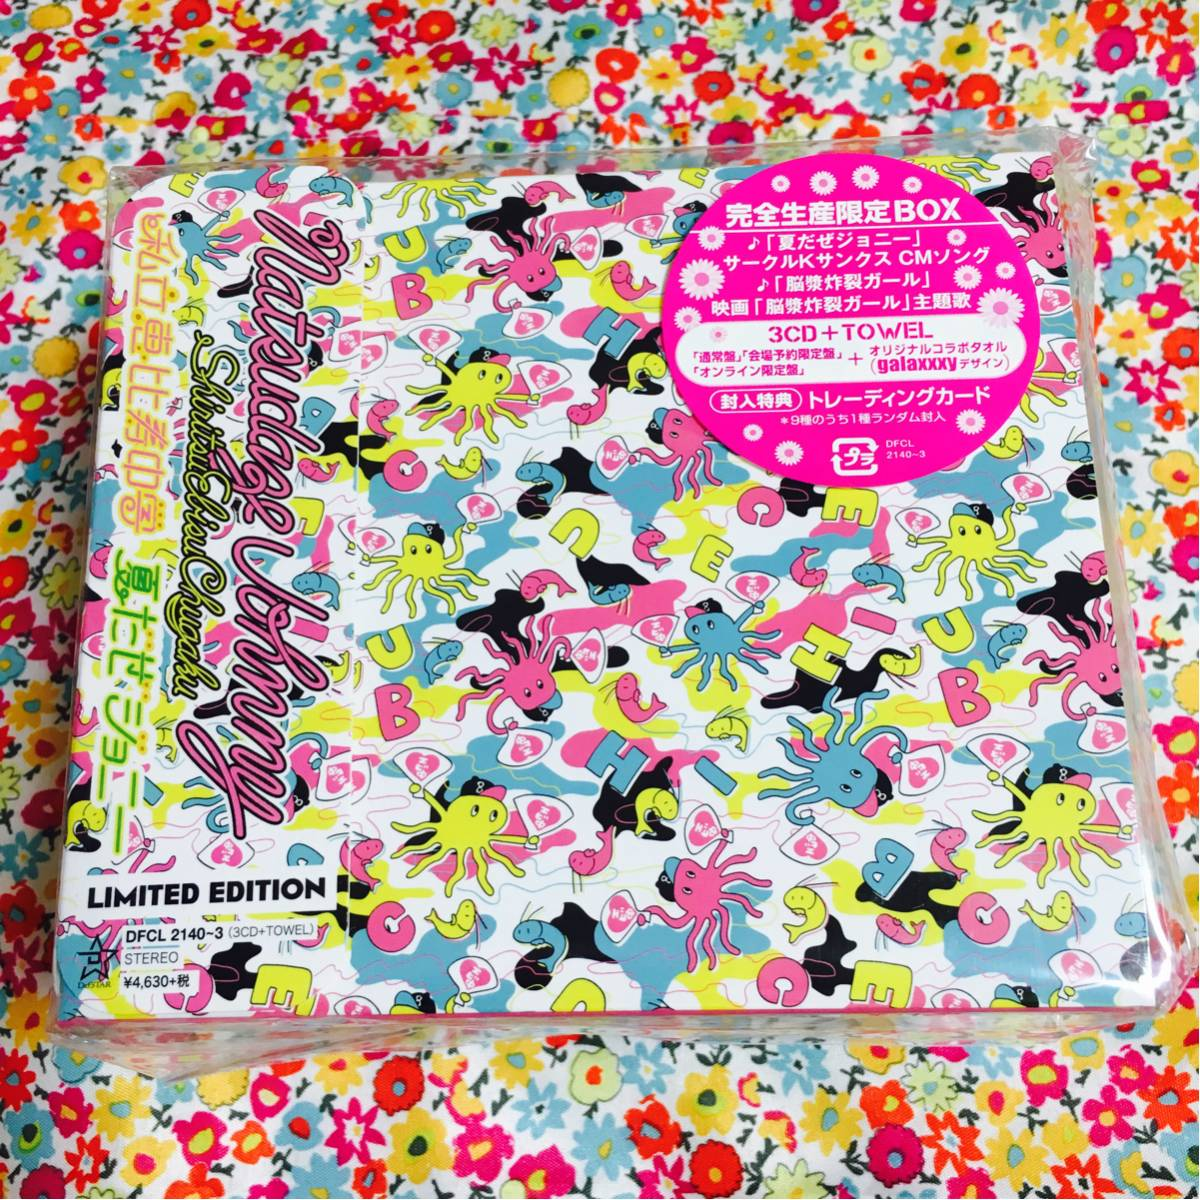 CD エビ中 私立恵比寿中学 夏だぜジョニー 完全生産限定盤BOX ライブグッズの画像